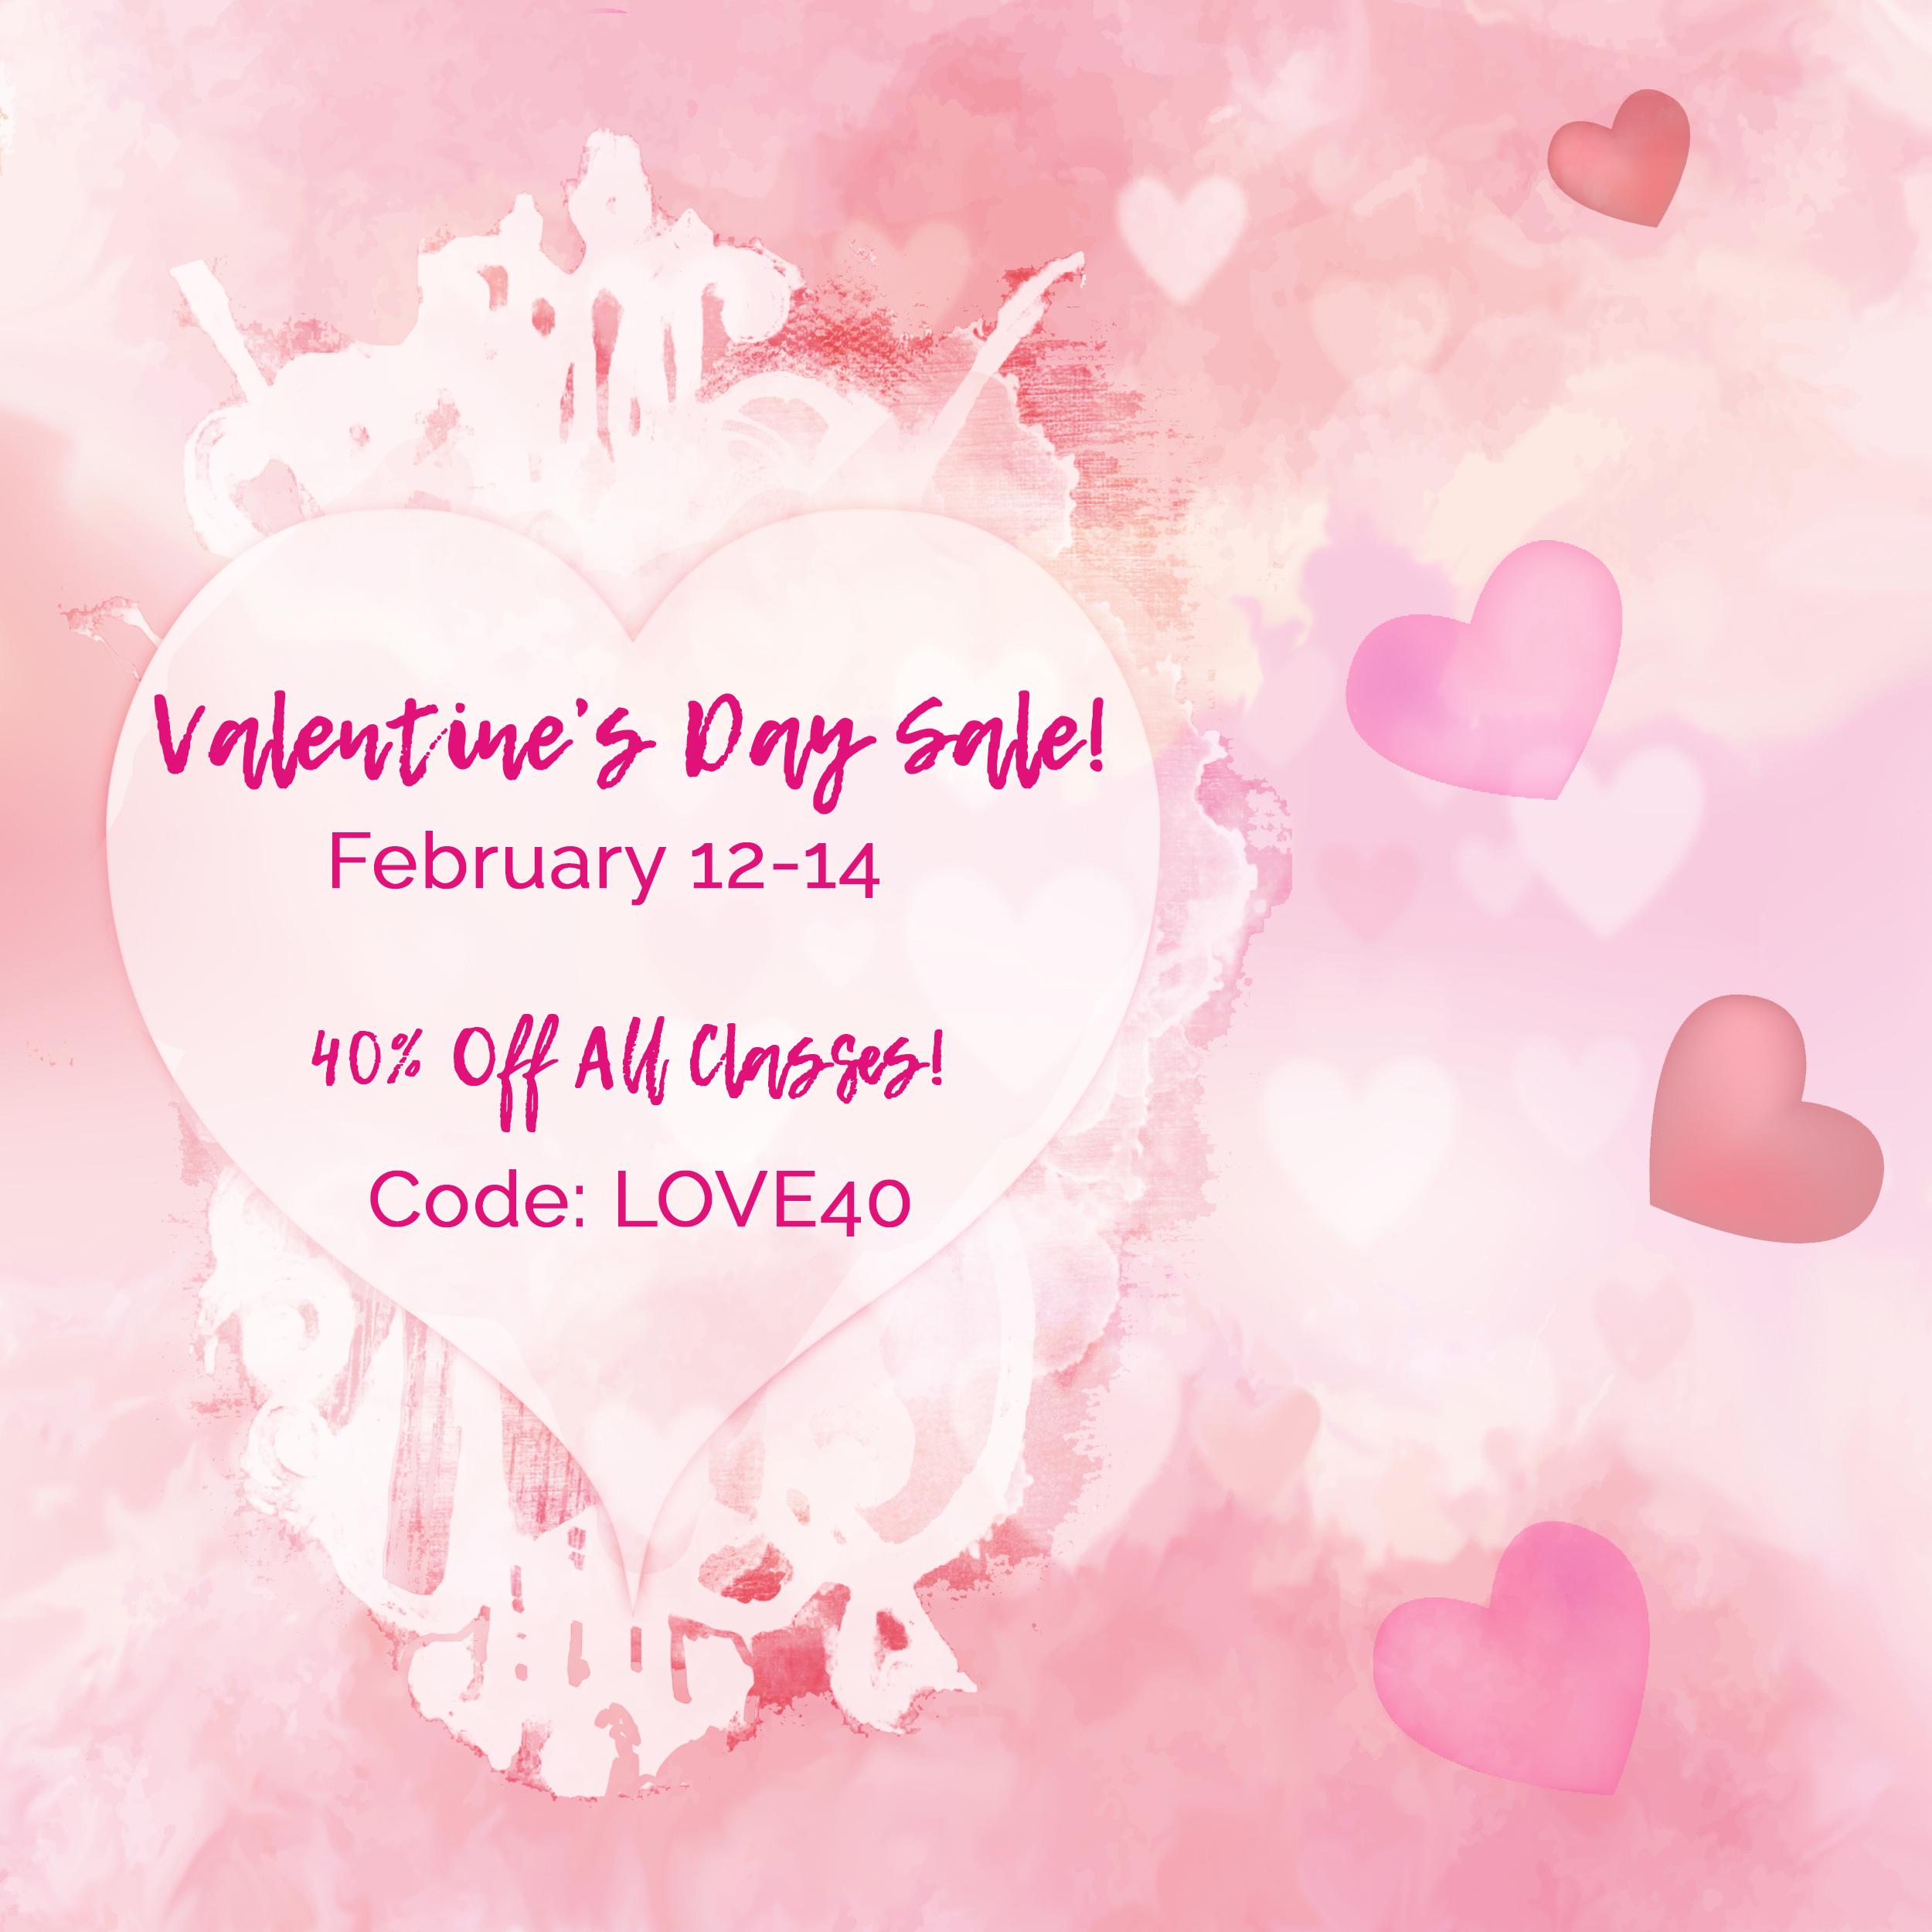 Valentine ad.jpg